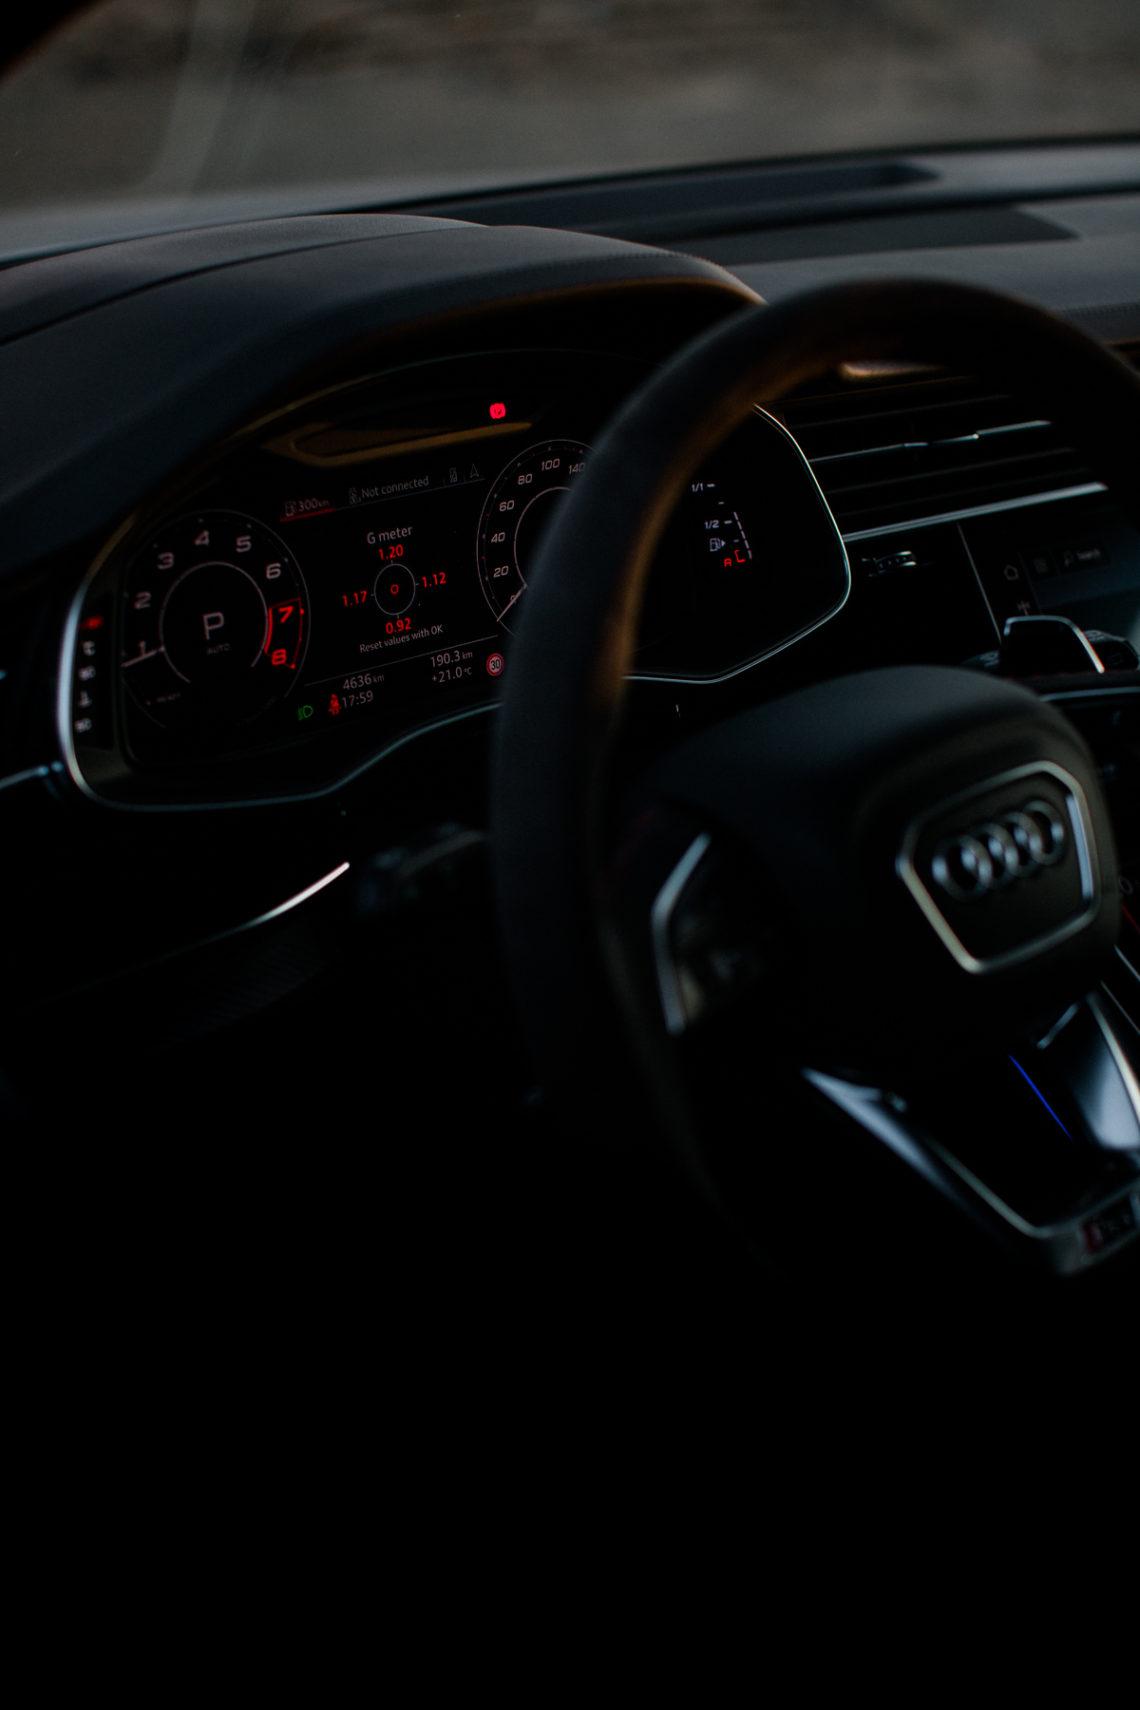 audi rsq8 lenkrad cockpit anzeigetafeln